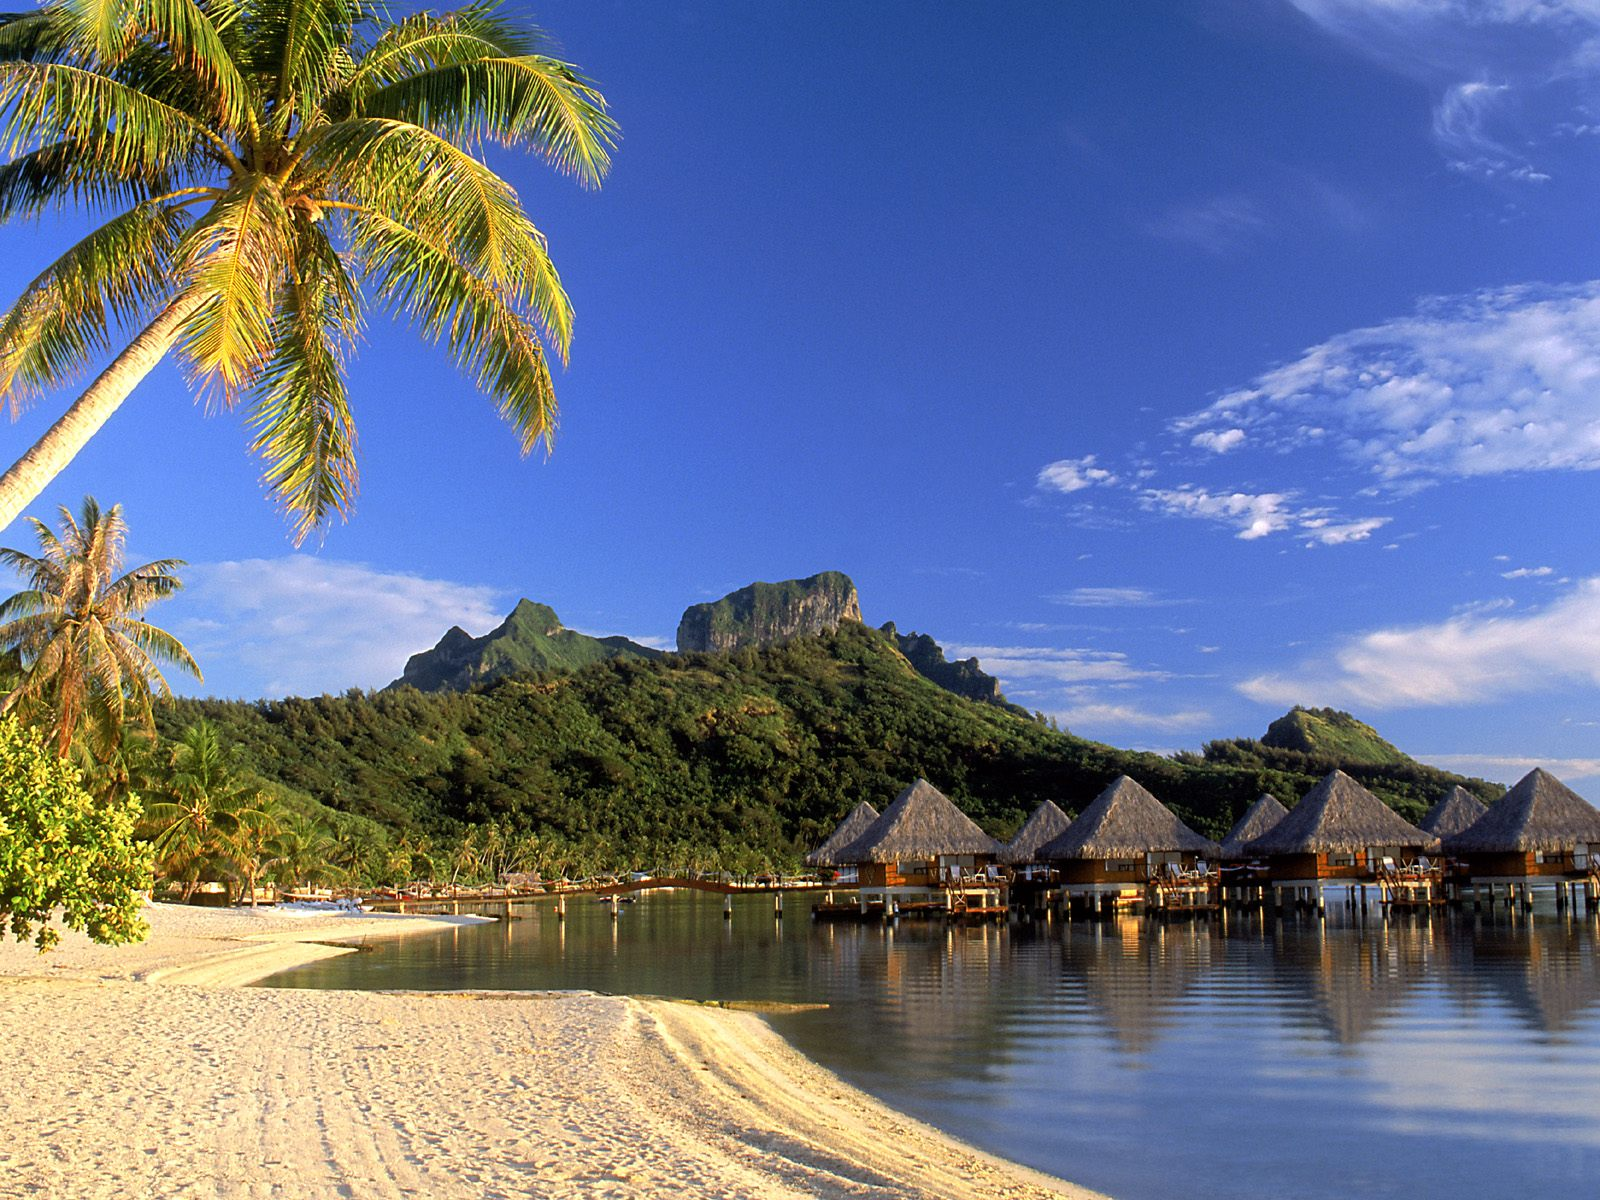 tropical island beach scenery beatiful beach desktop wallpaper 1600x1200